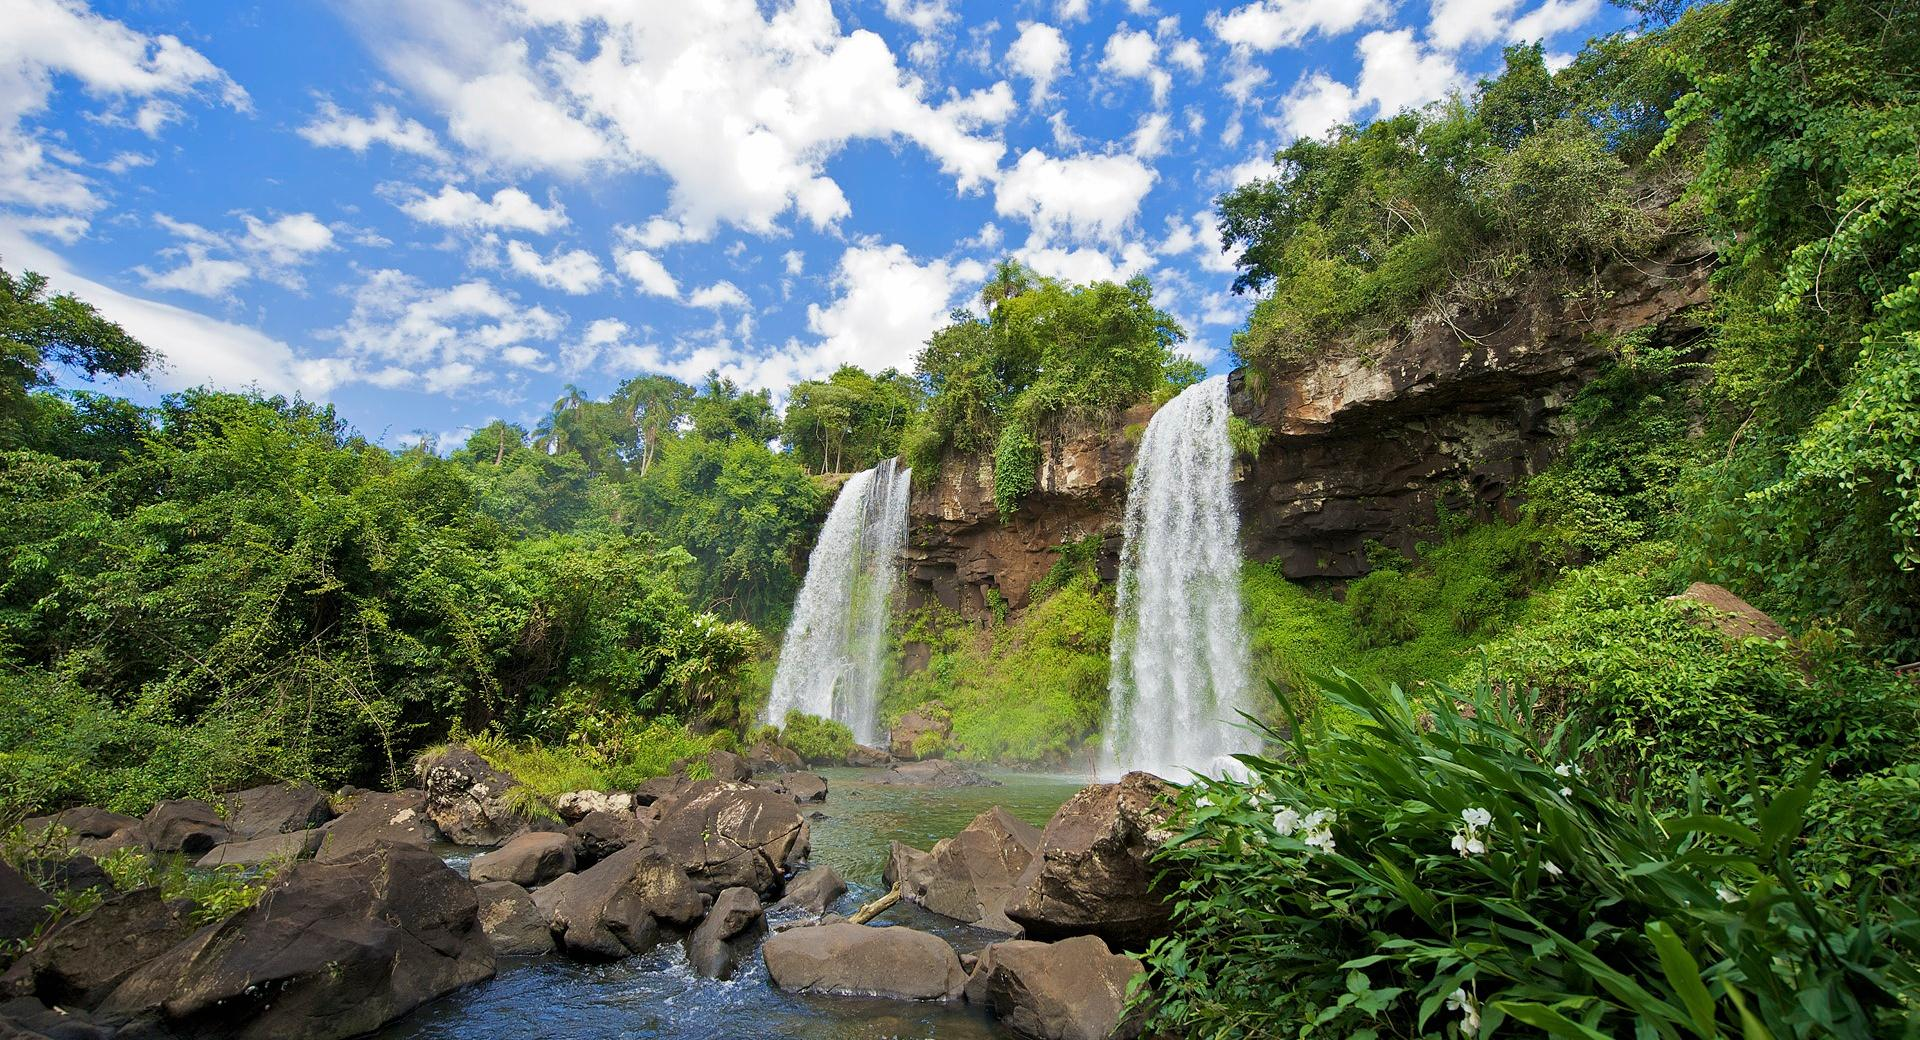 Iguazu Falls Argentina wallpapers HD quality